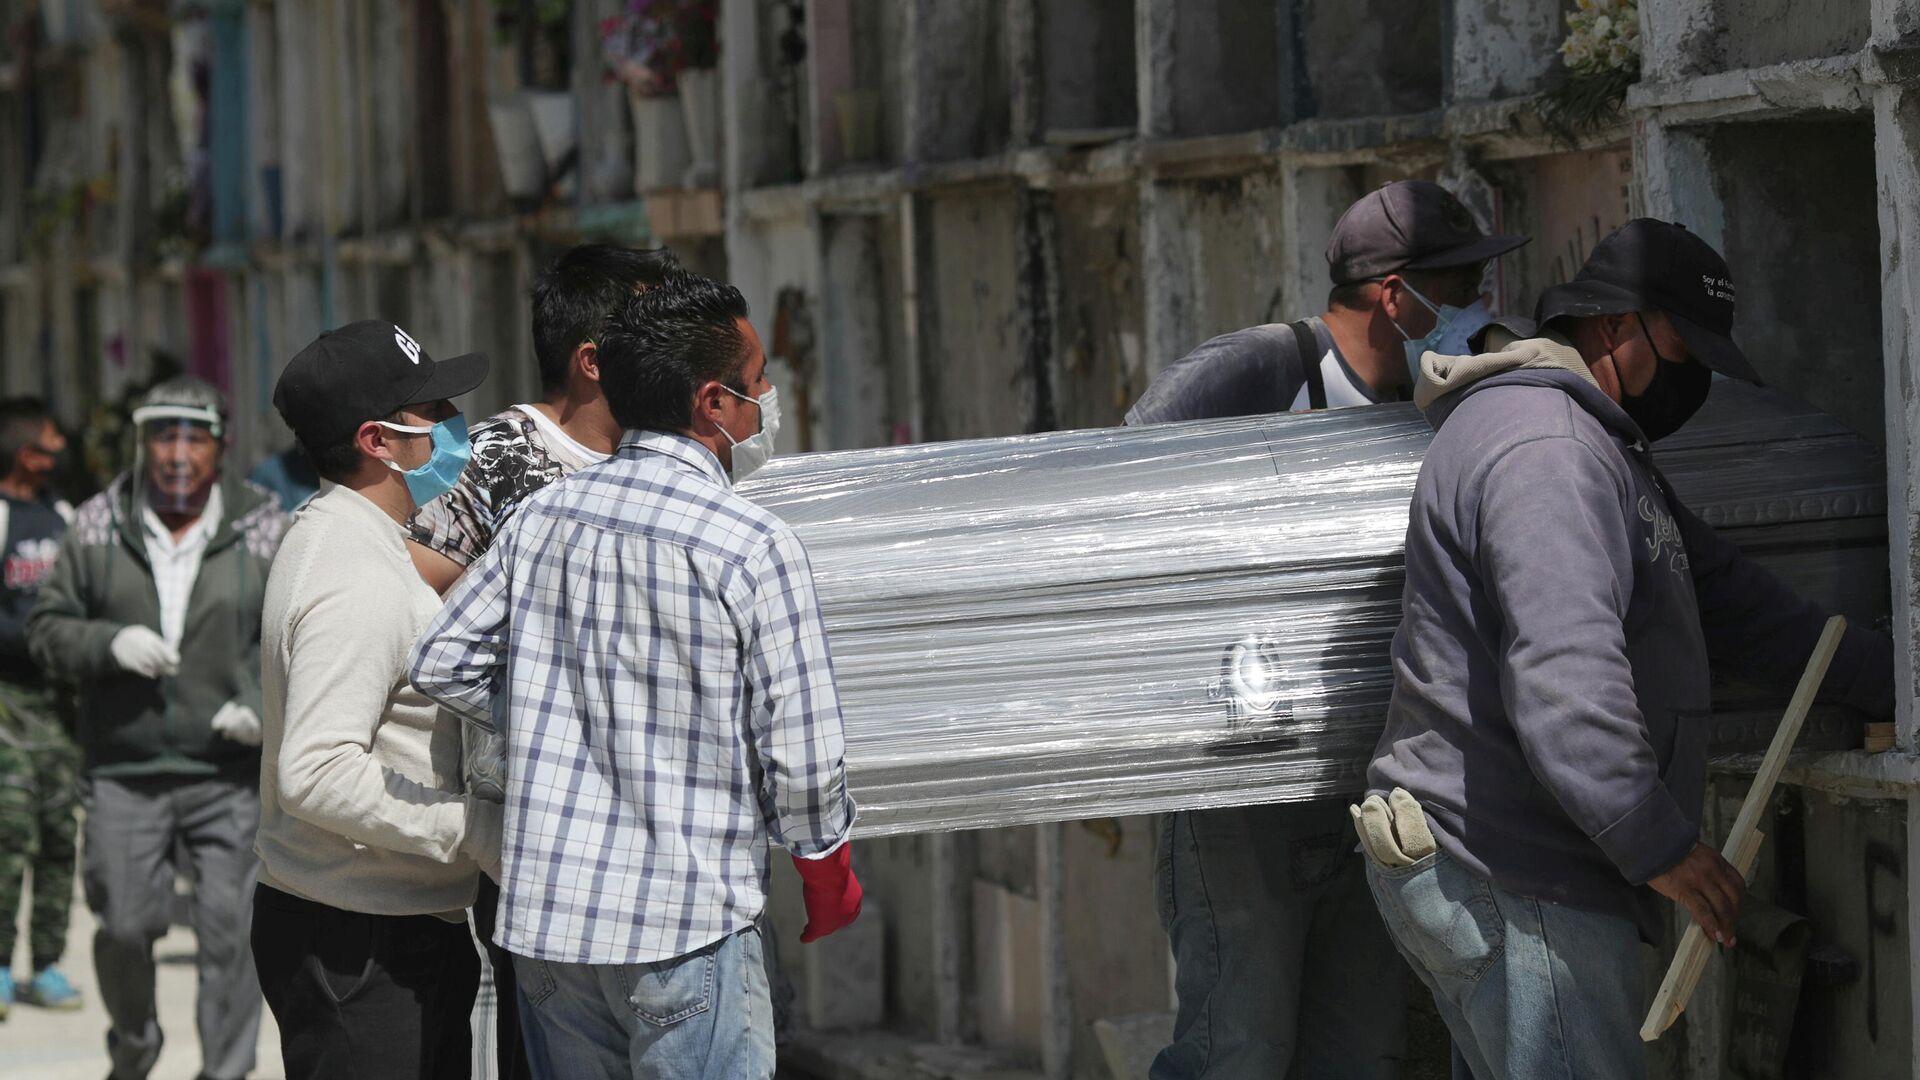 Funeral de un fallecido por COVID-19 en México - Sputnik Mundo, 1920, 19.02.2021